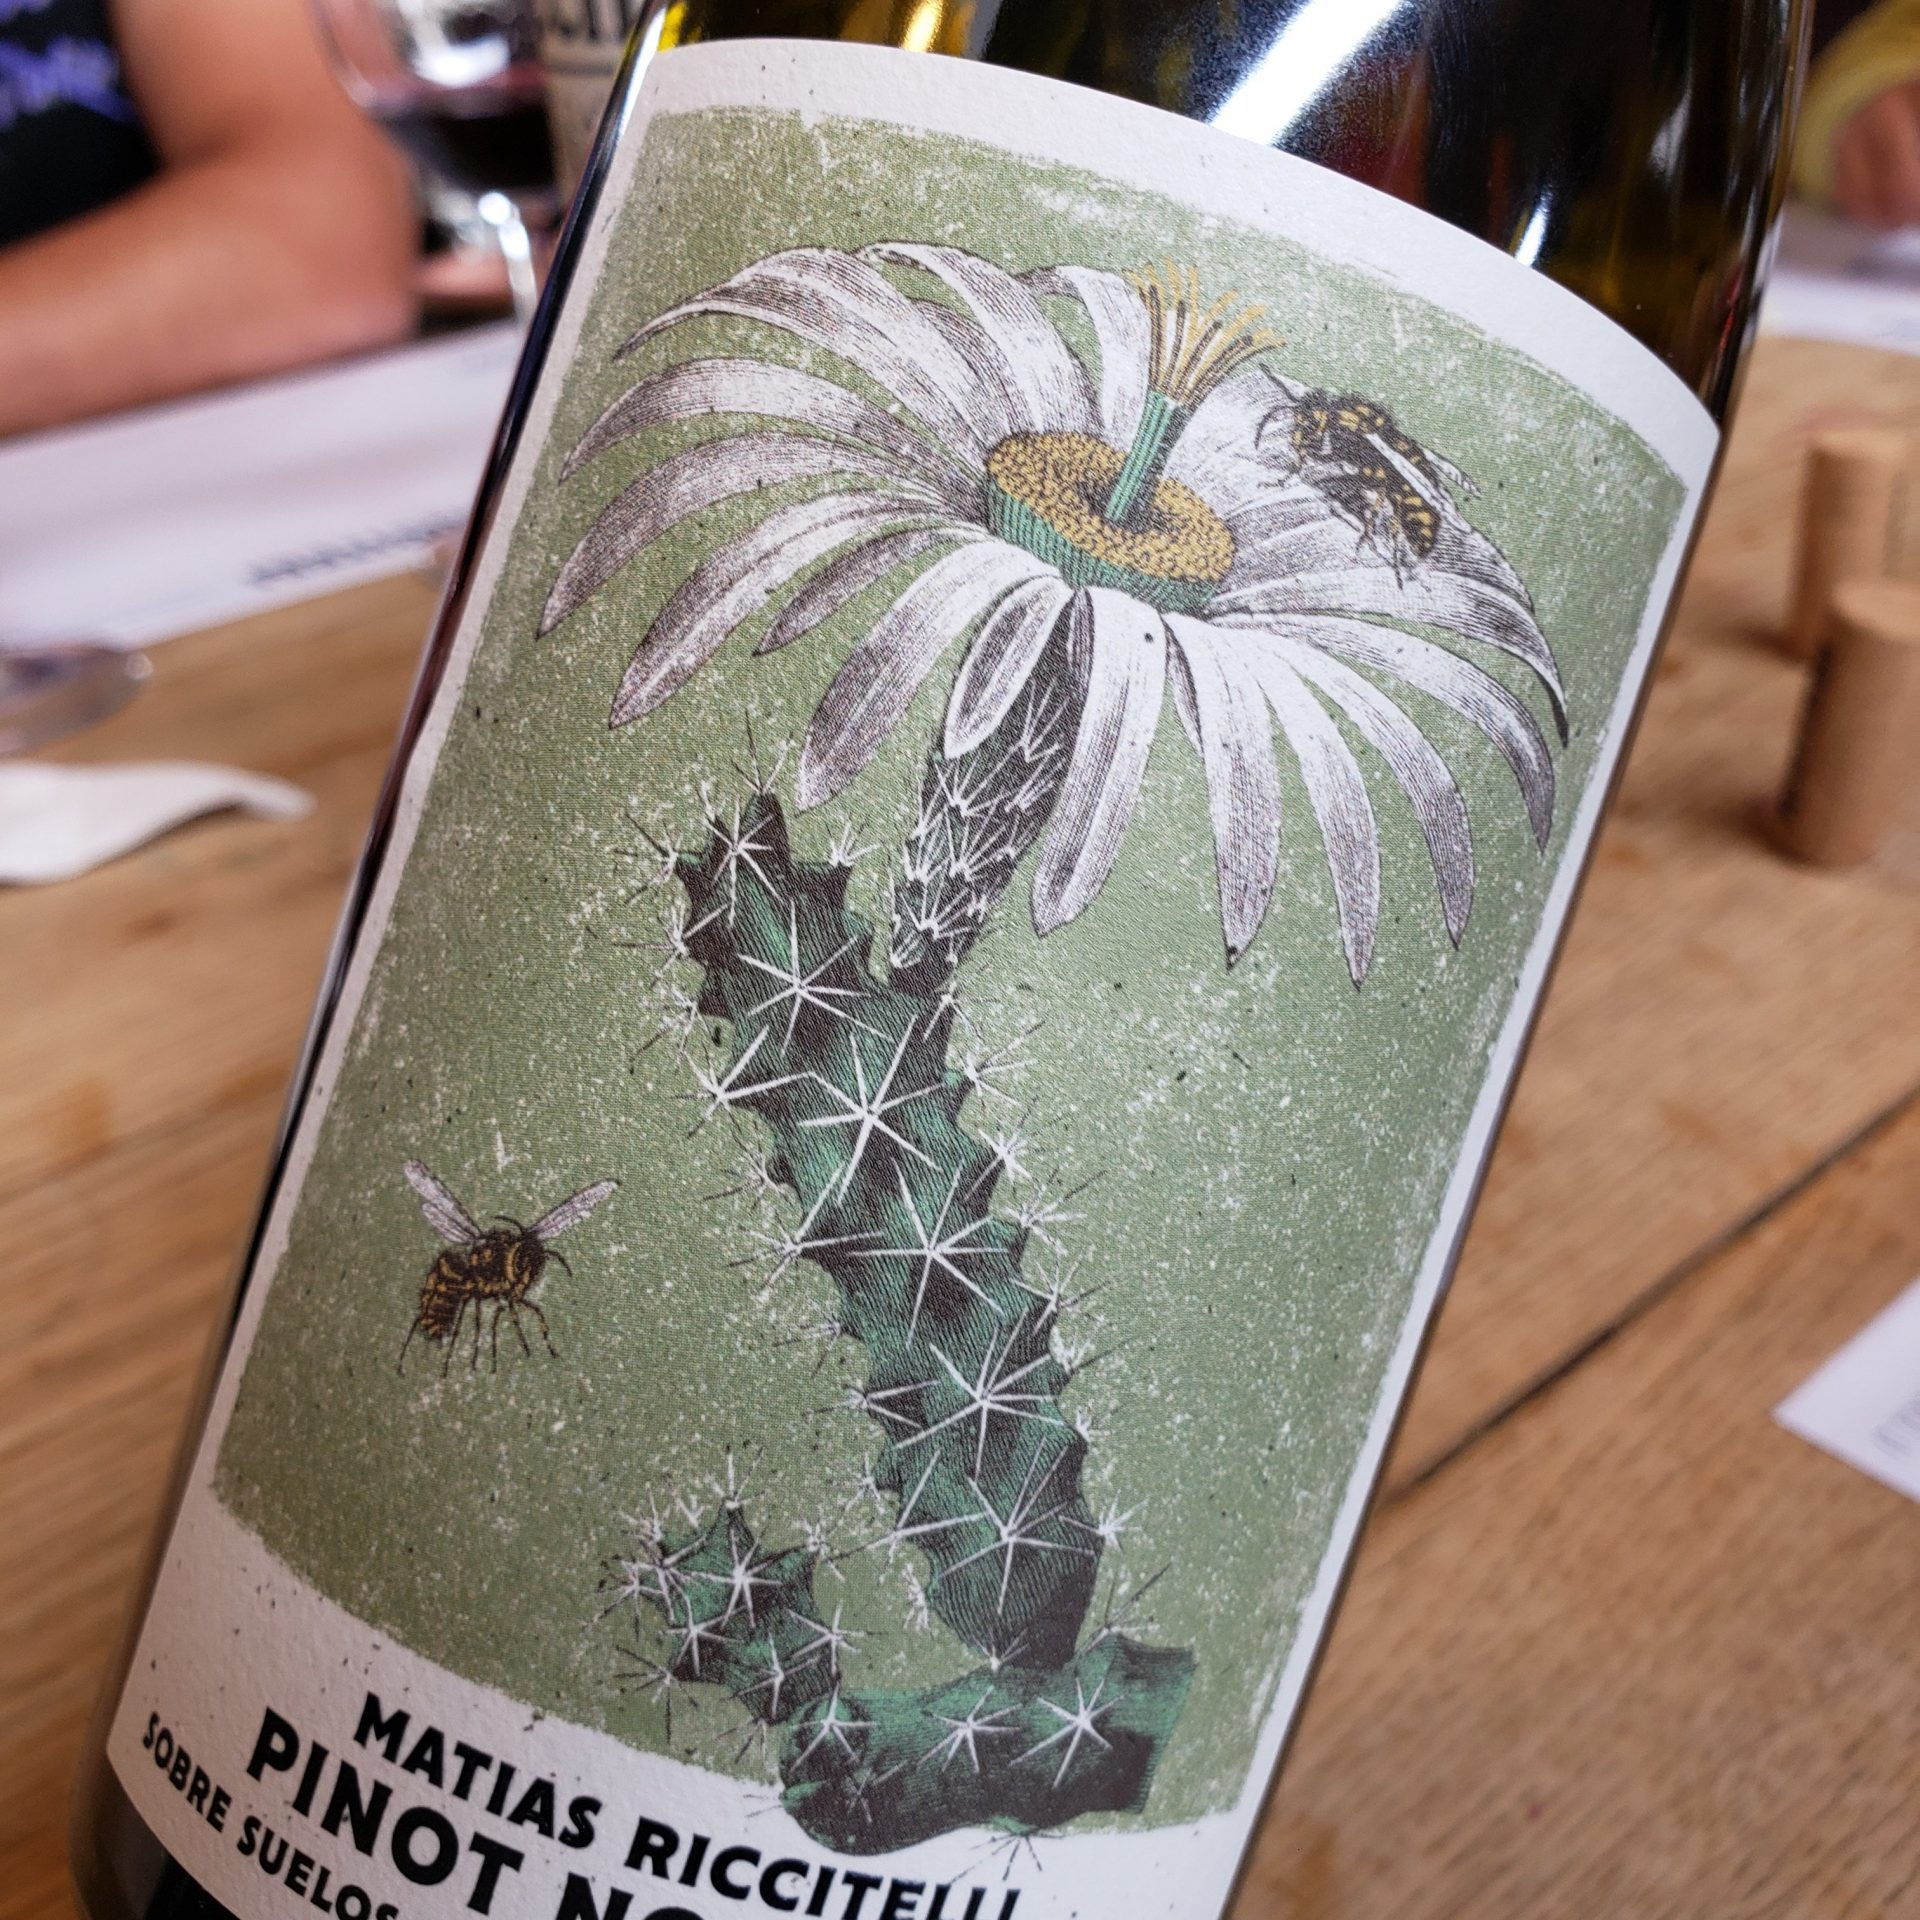 Riccitelli Bistró - Riccitelli Wines - Matías Riccitelli Vlle de Uco Pinot Noir 2019